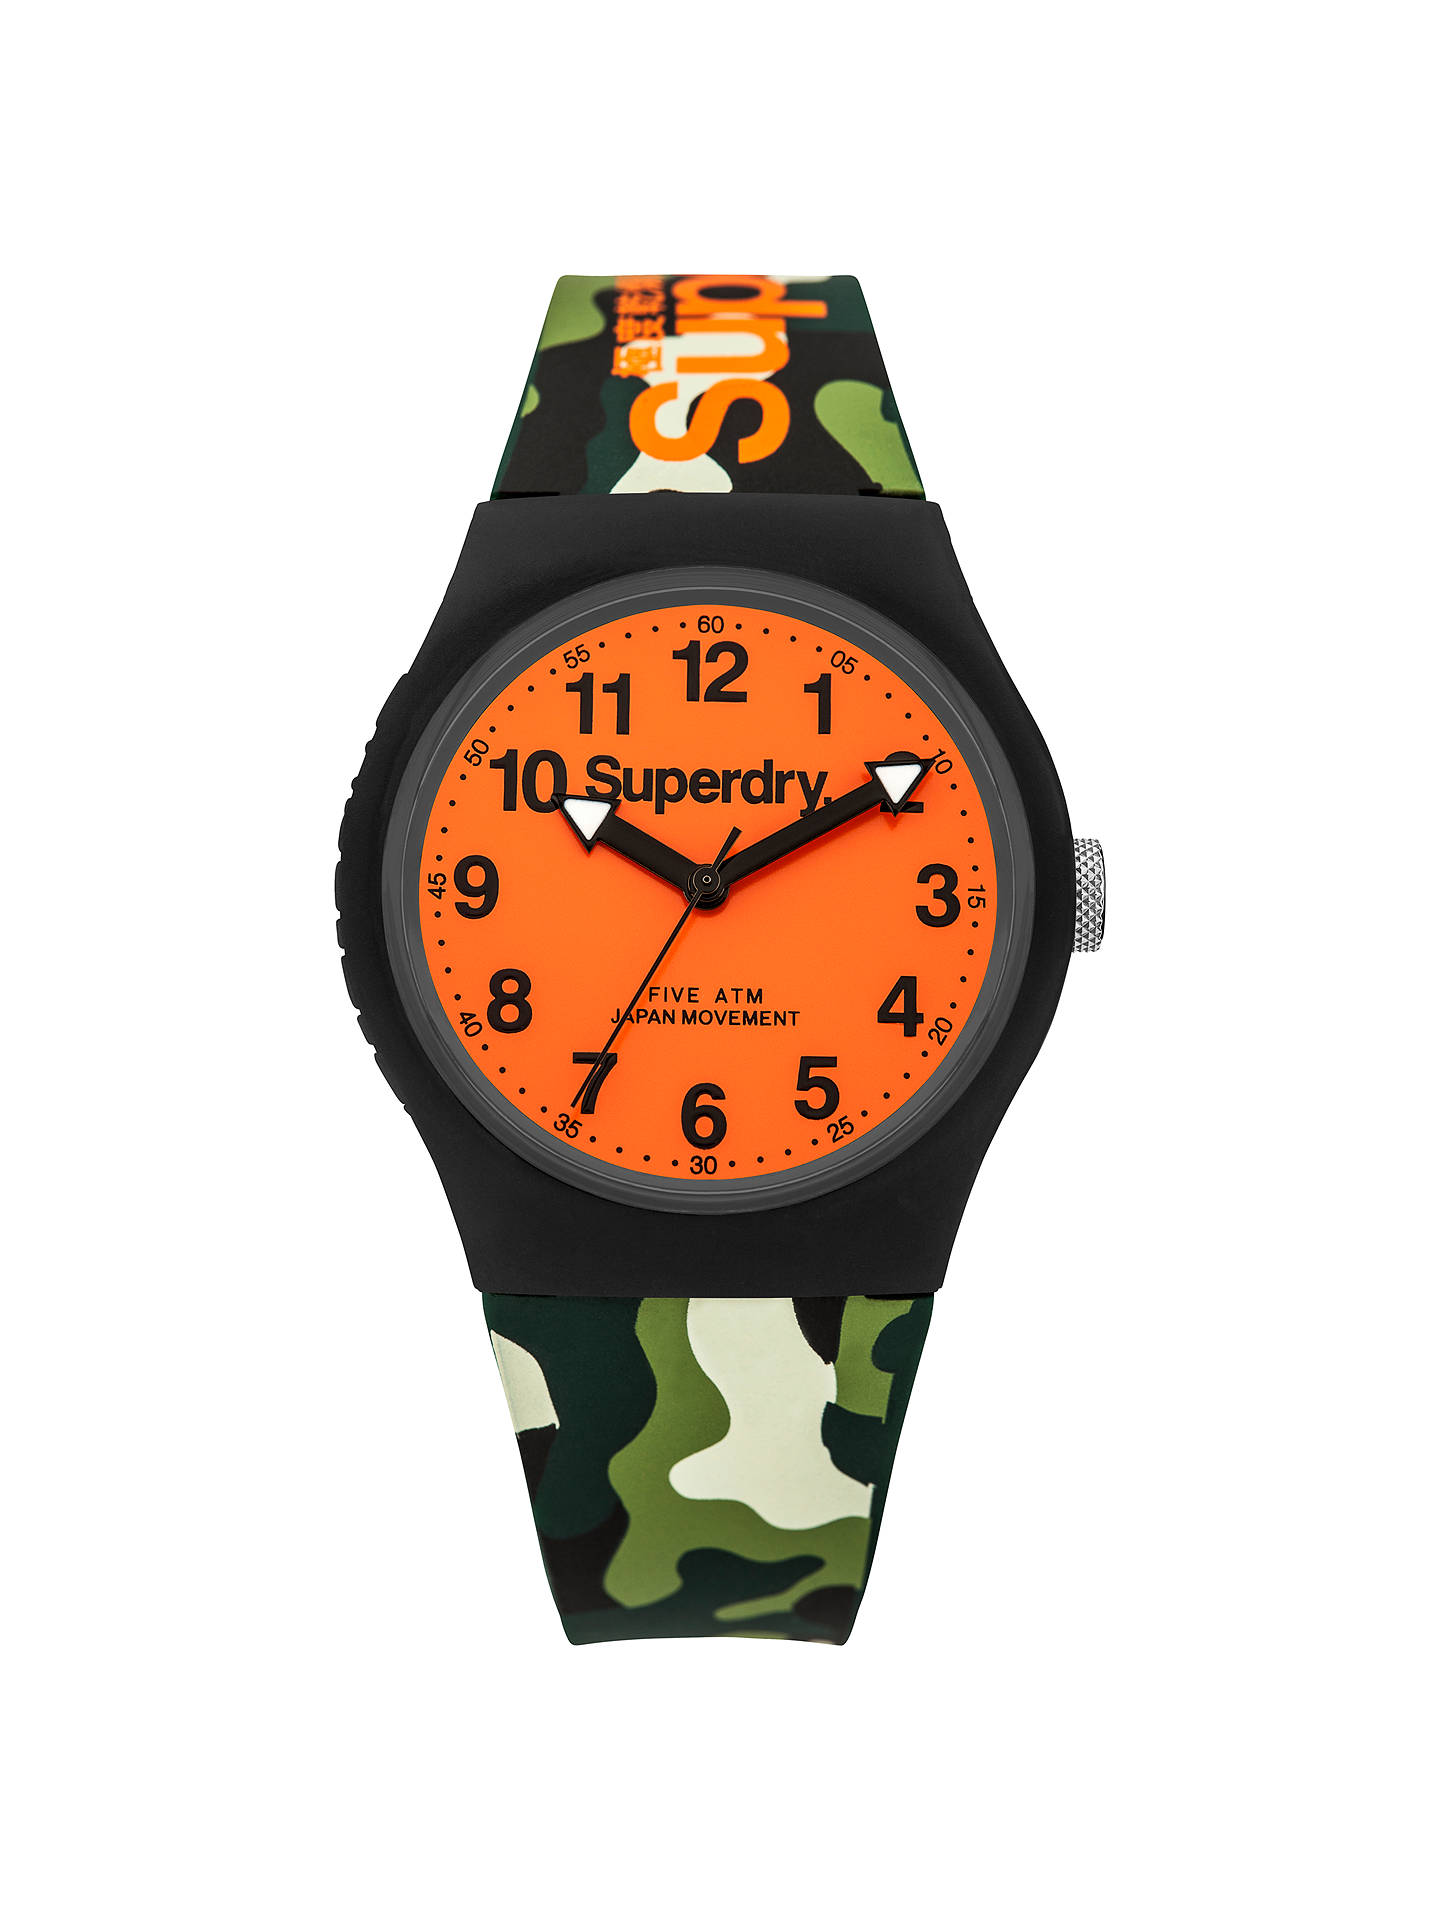 Superdry Syg164no Unisex Urban Silicone Strap Watch Camouflage Green Orange